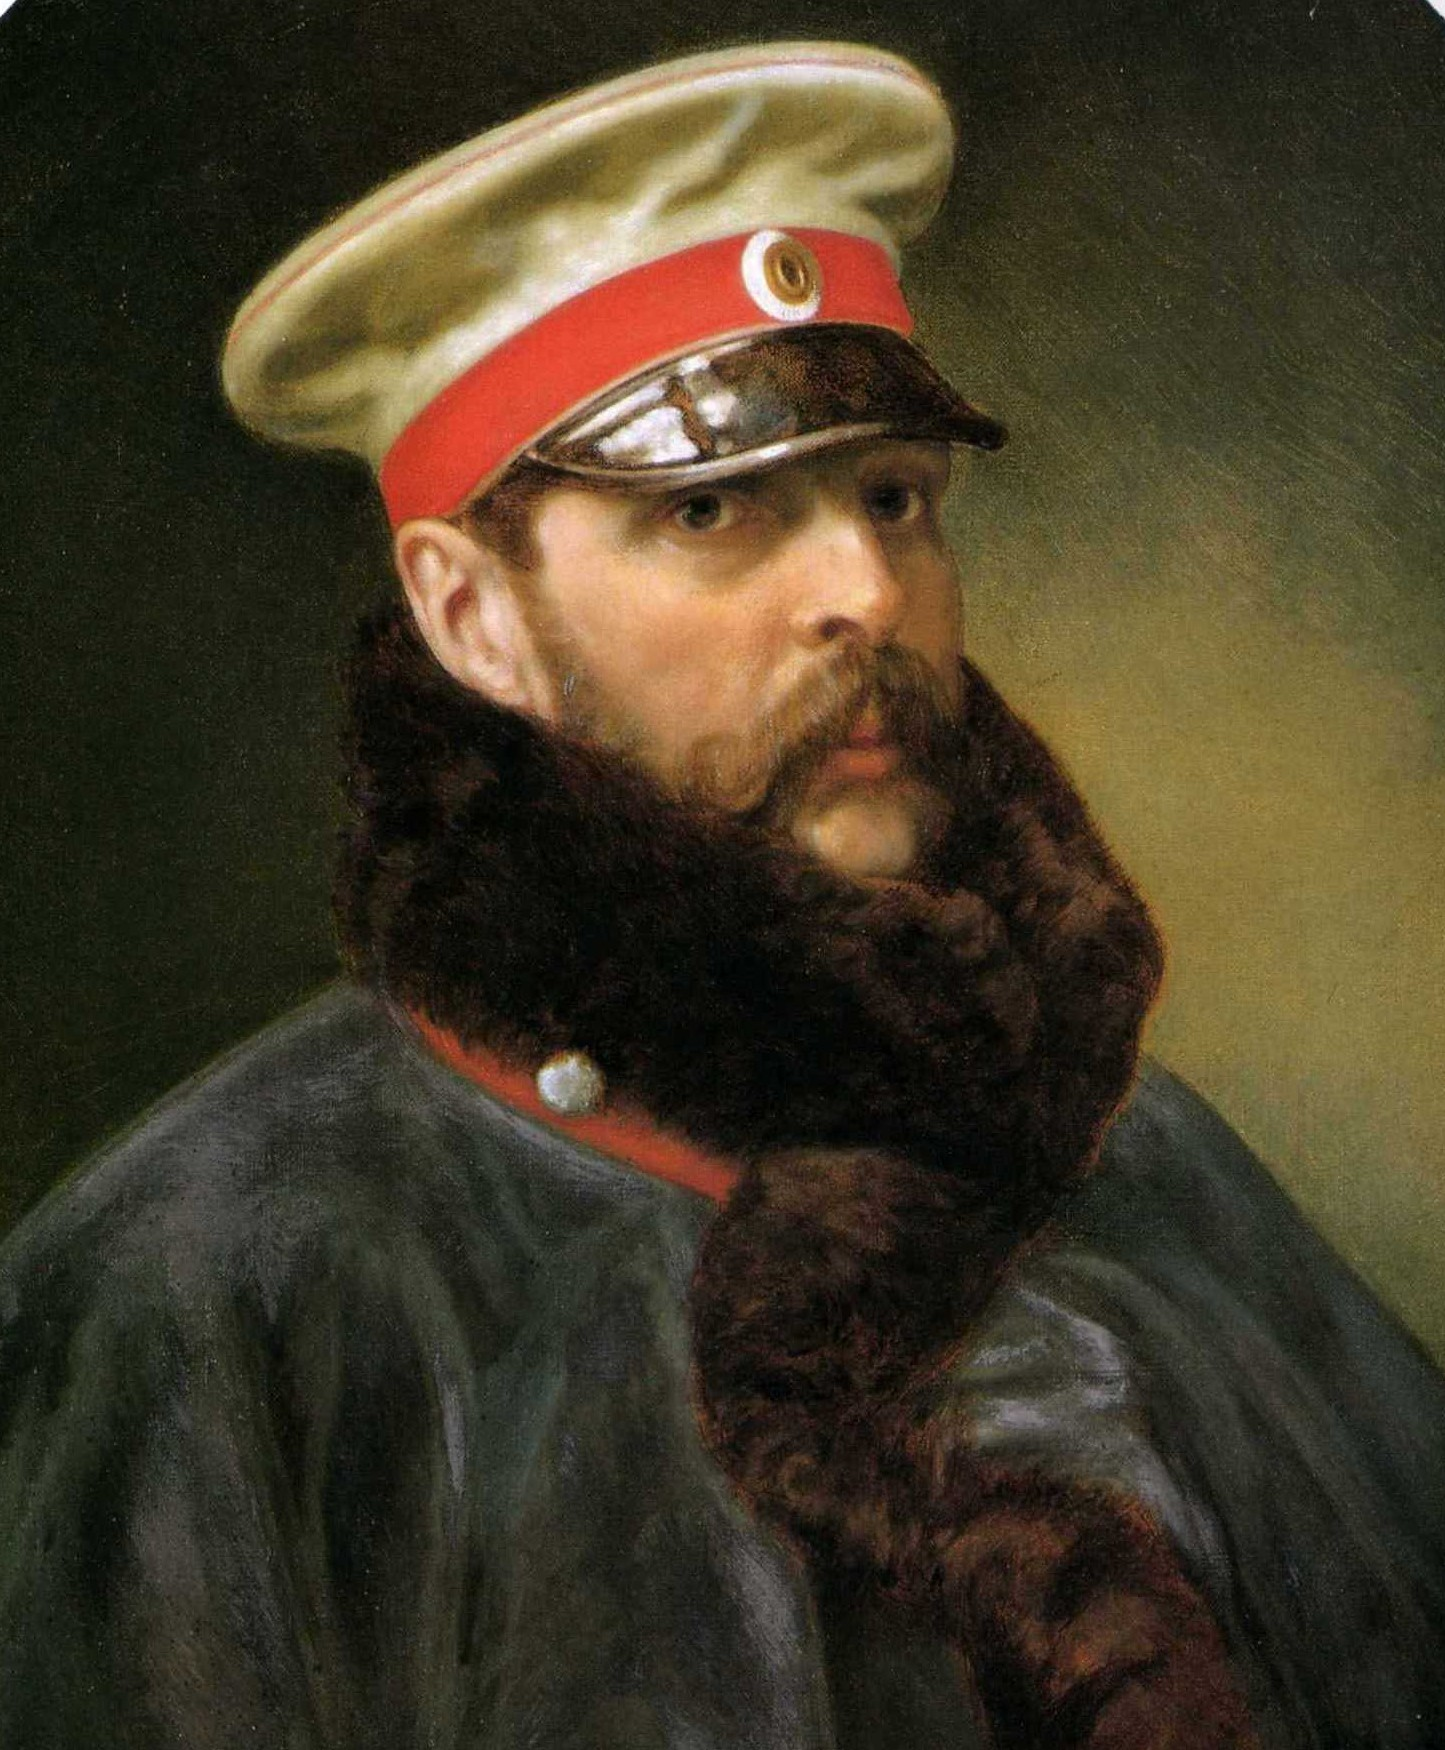 http://dic.academic.ru/pictures/wiki/files/84/Tsar_Alexander_II_-4.jpg